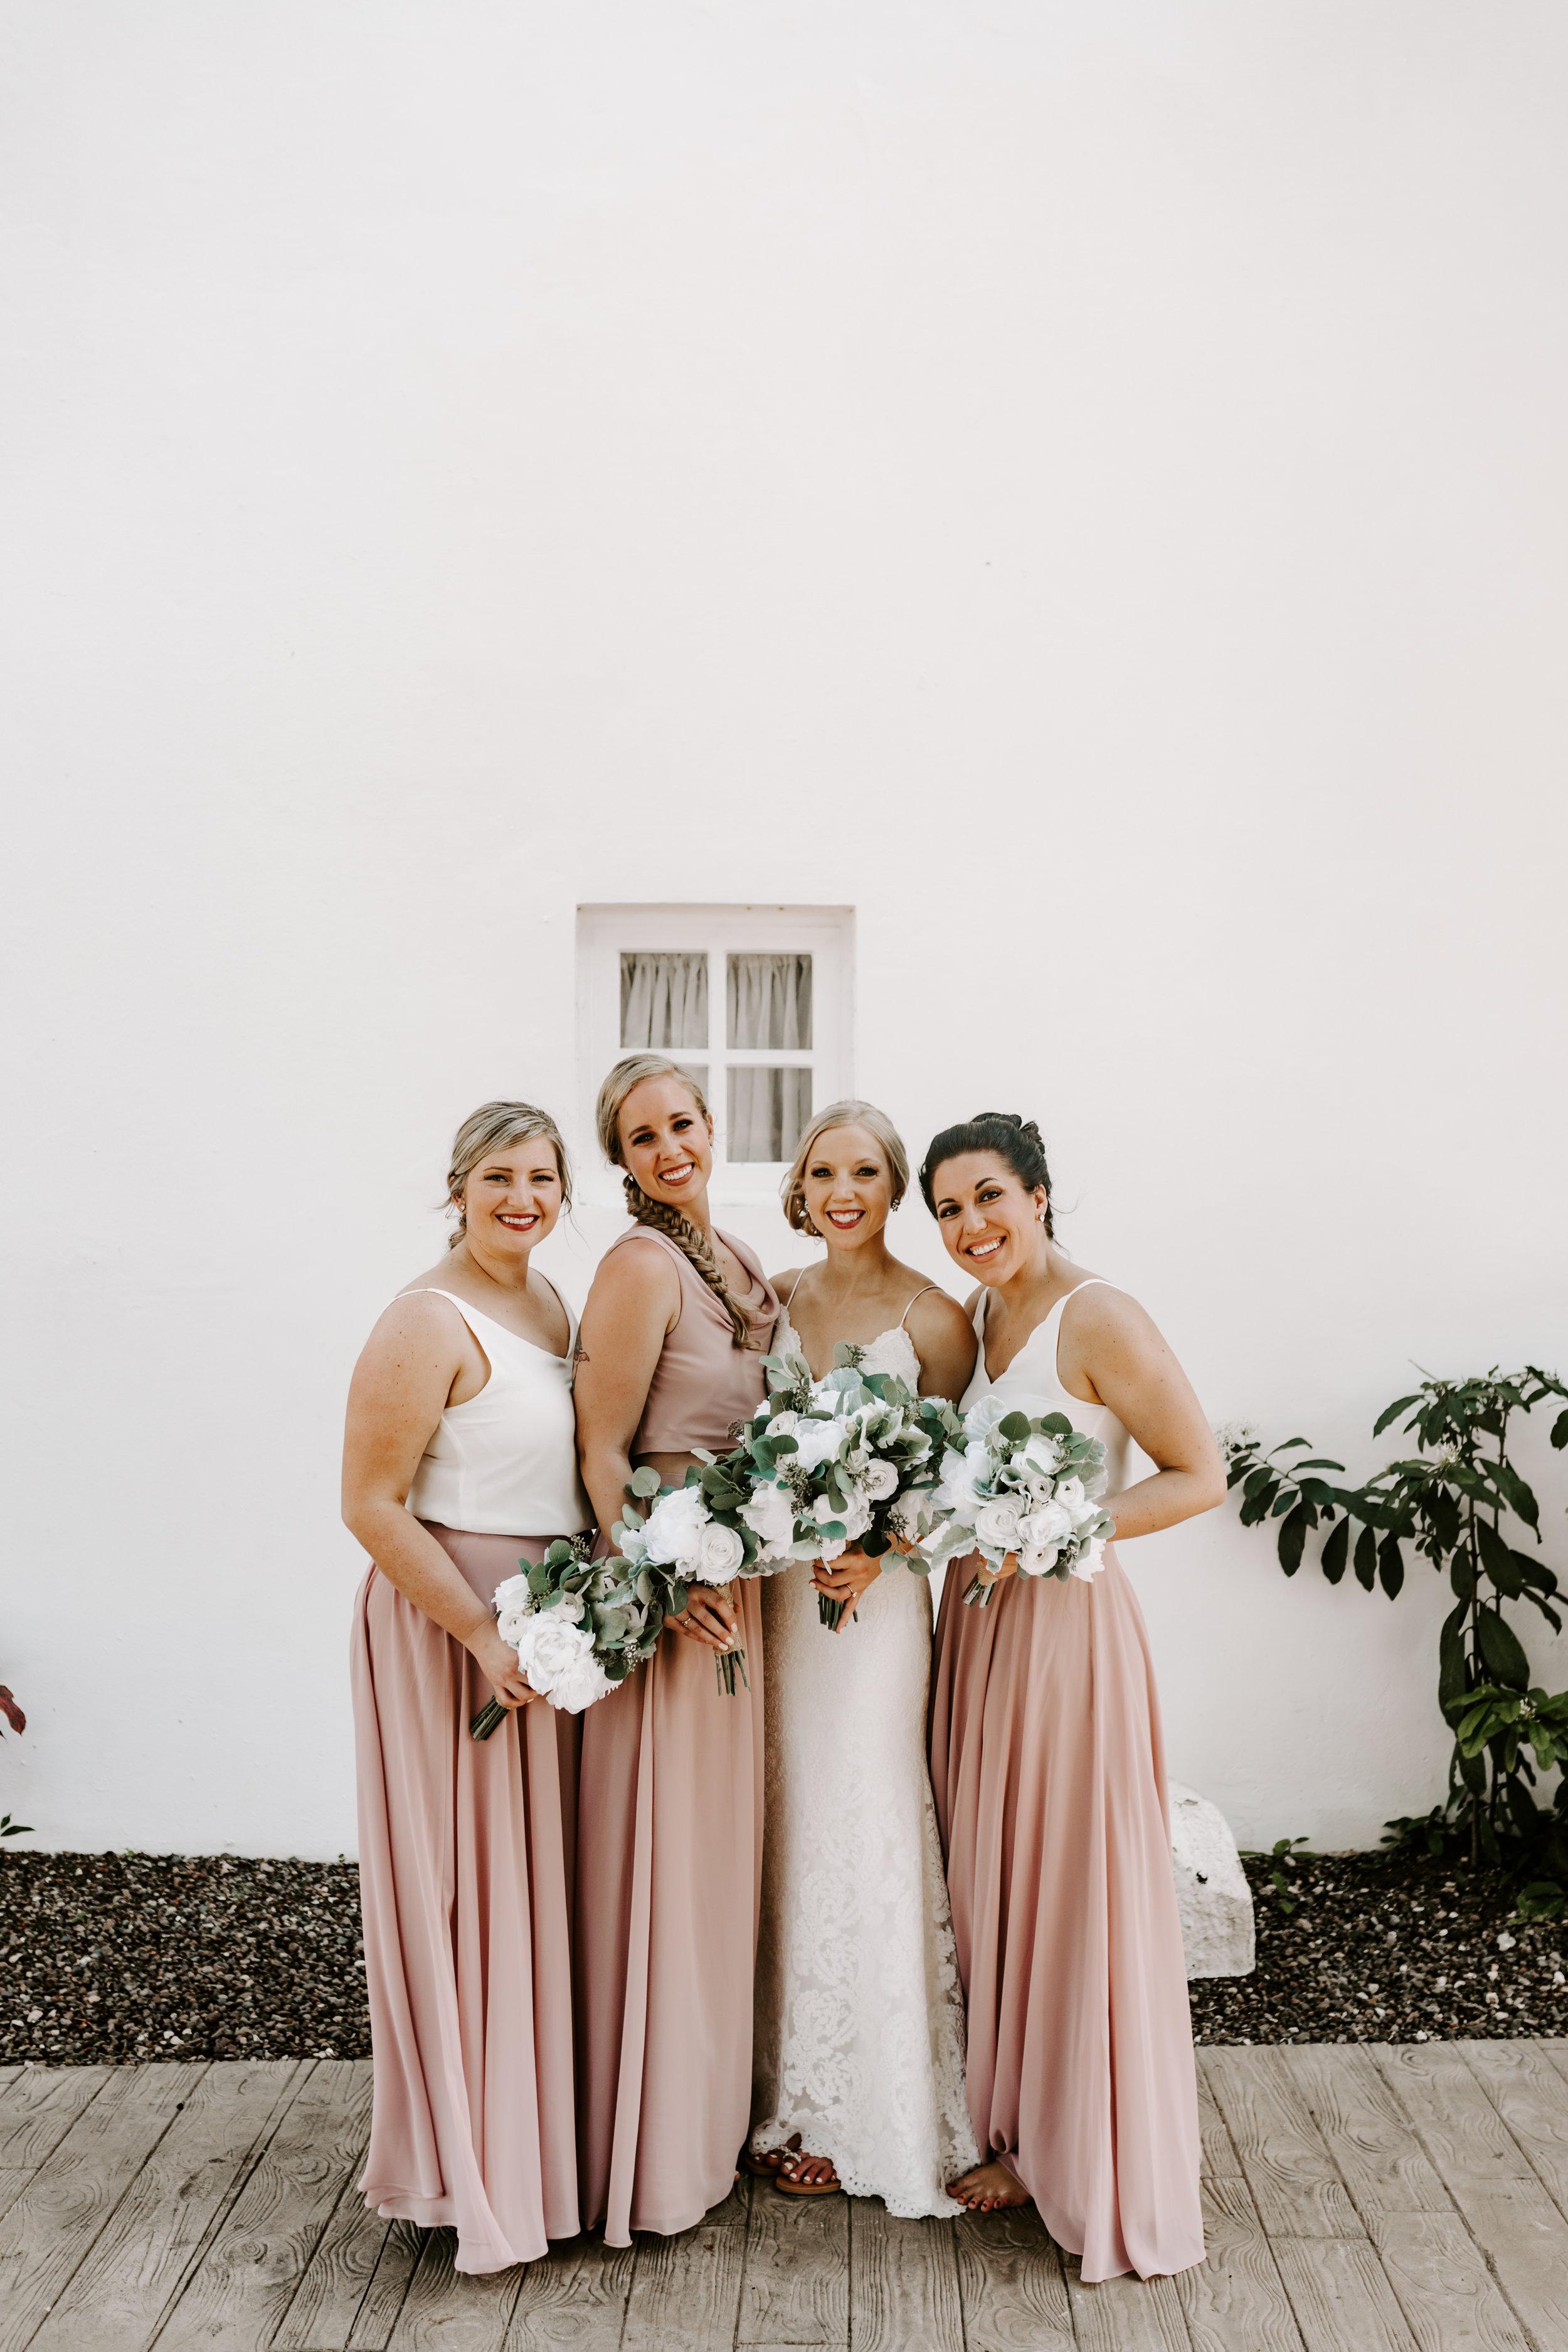 beach wedding, bridesmaids, 2 piece bridesmaids dresses, destination wedding, jamaica wedding, define fettle